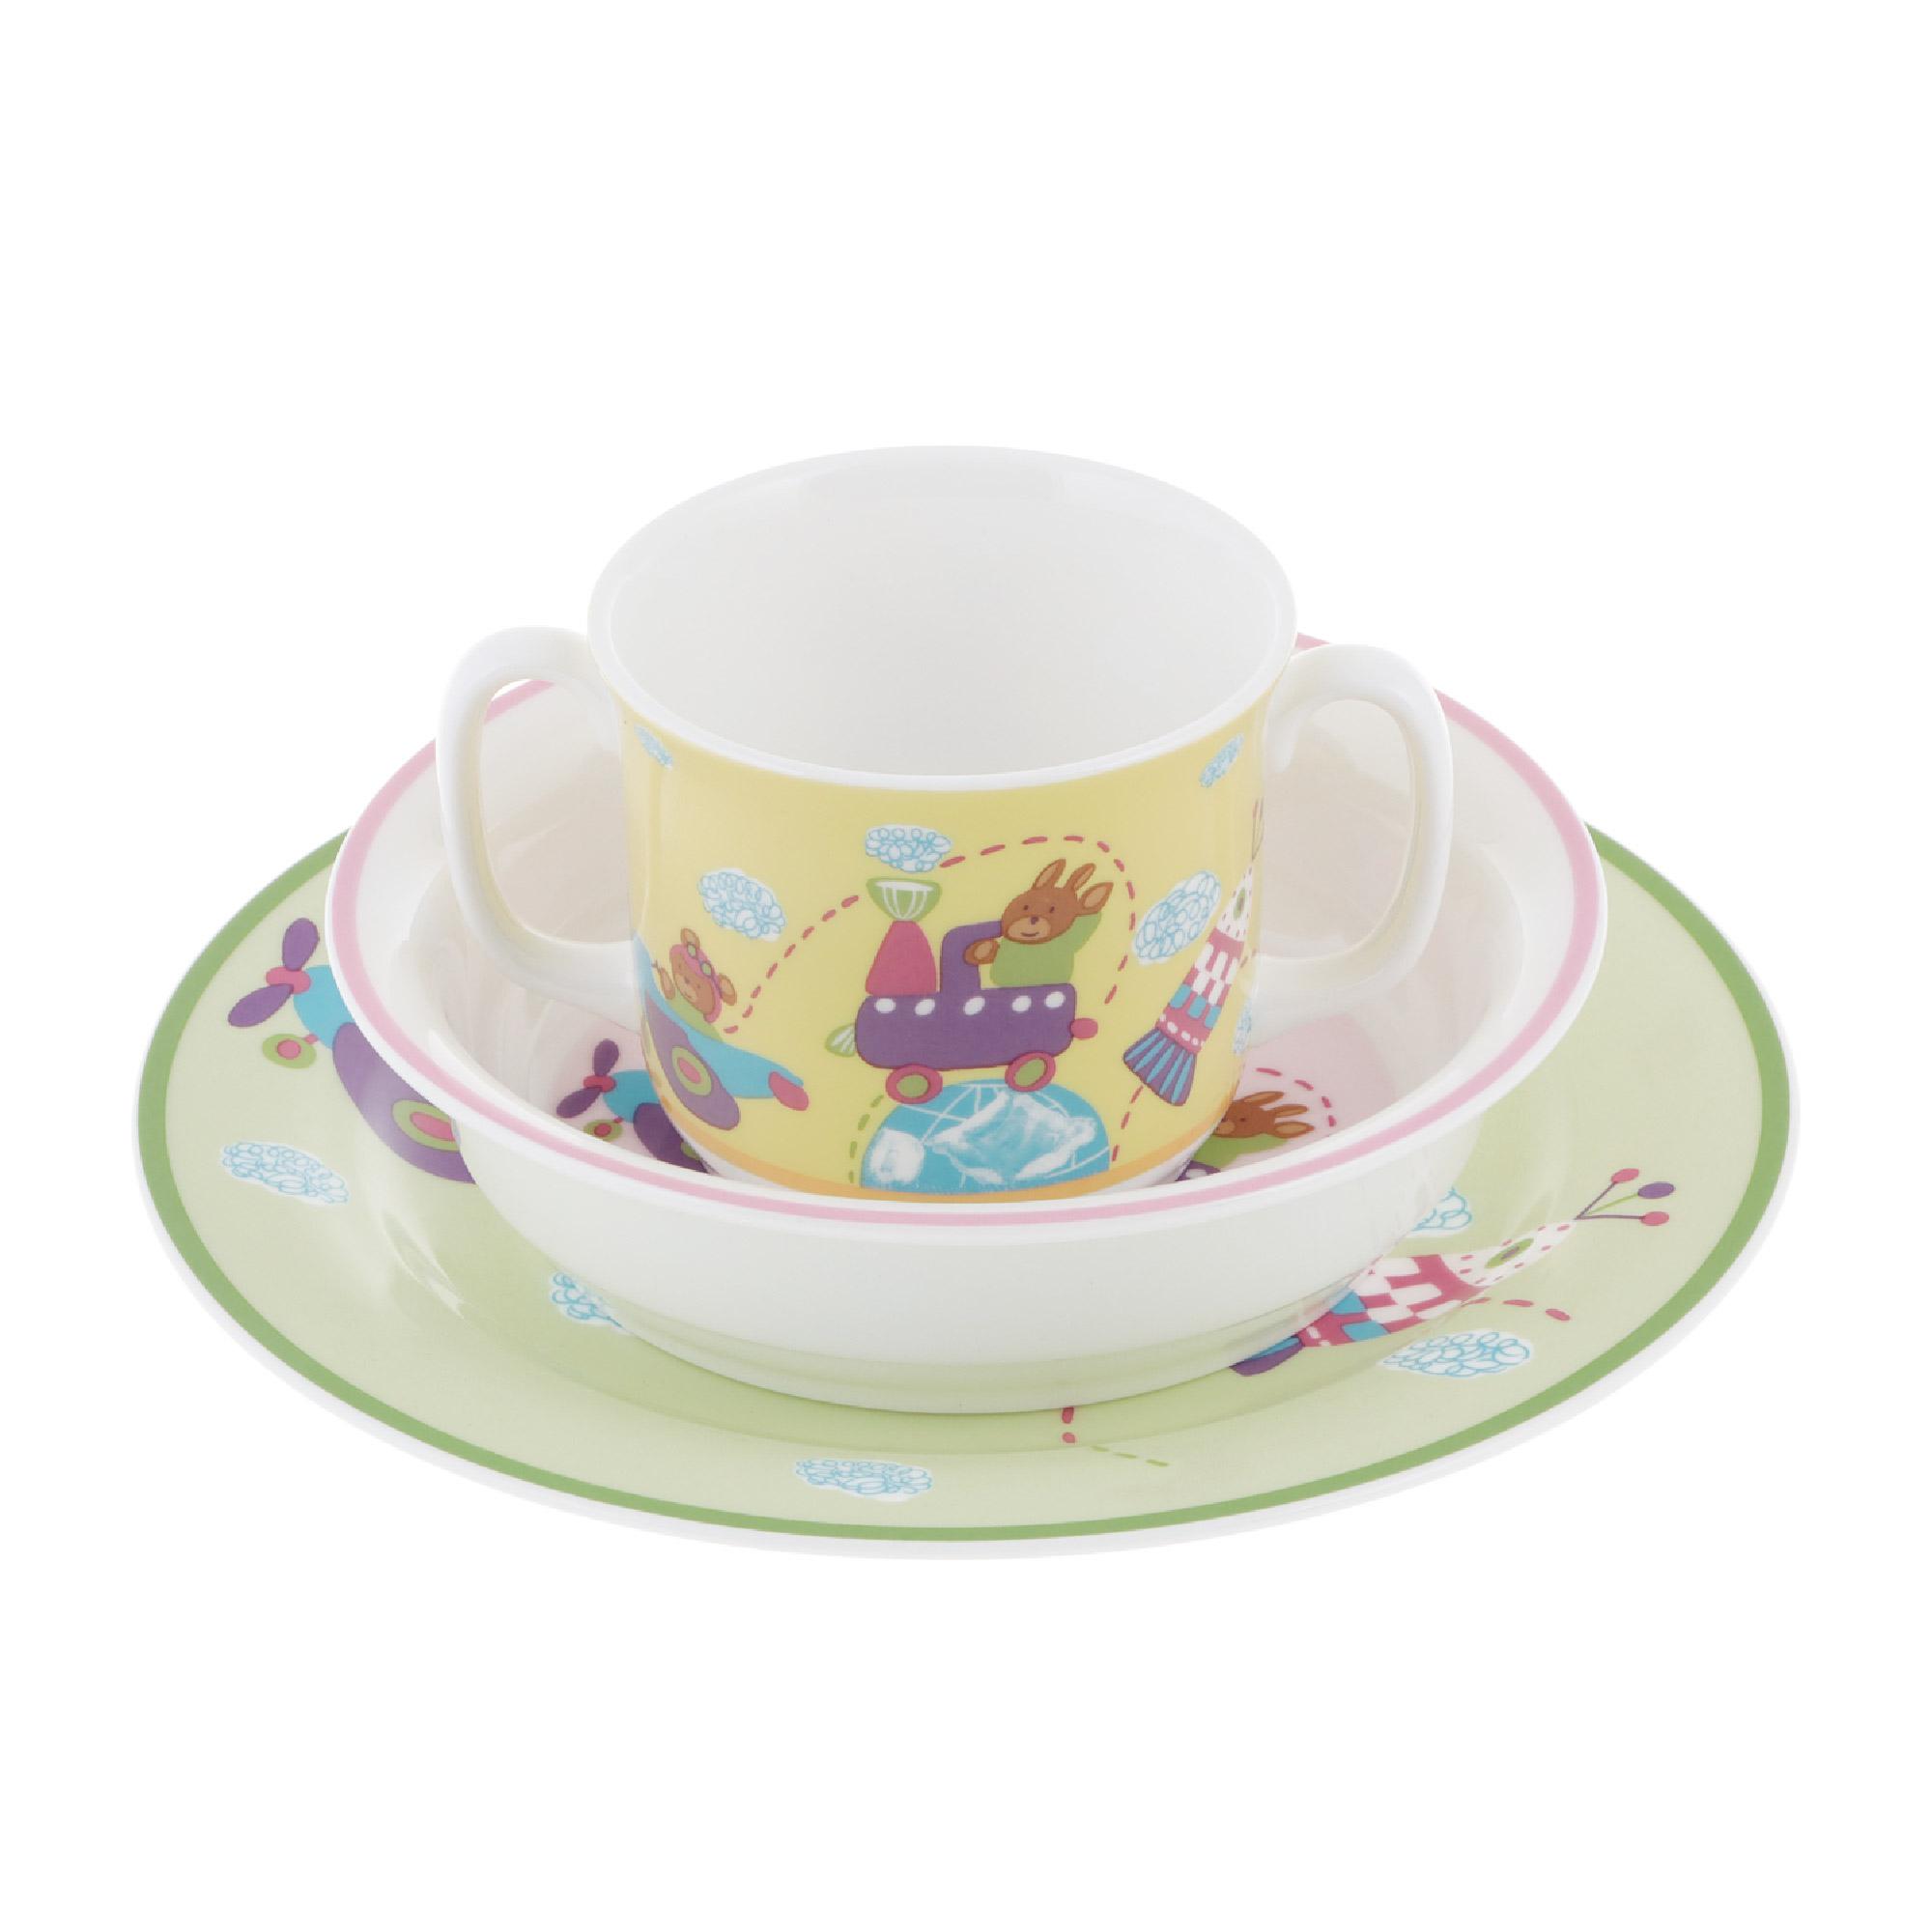 Набор посуды Hankook Клауд Трип 3 предмета